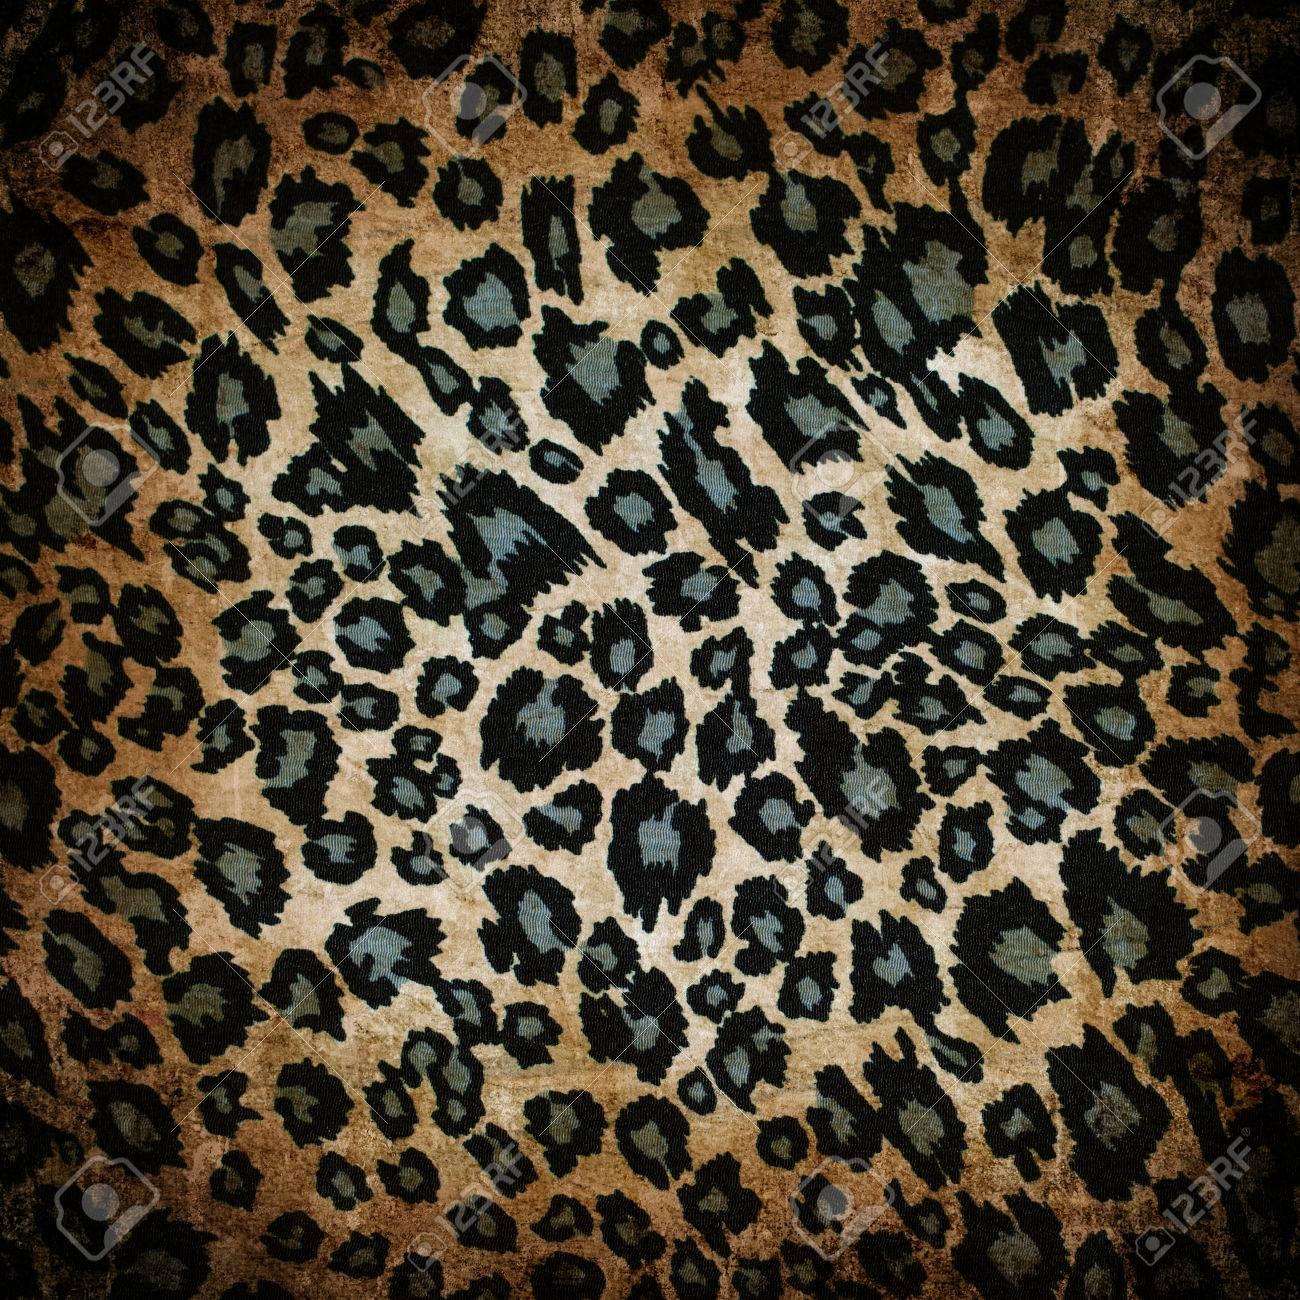 Wild animal skin pattern - leopard or cheetah Stock Photo - 22551061